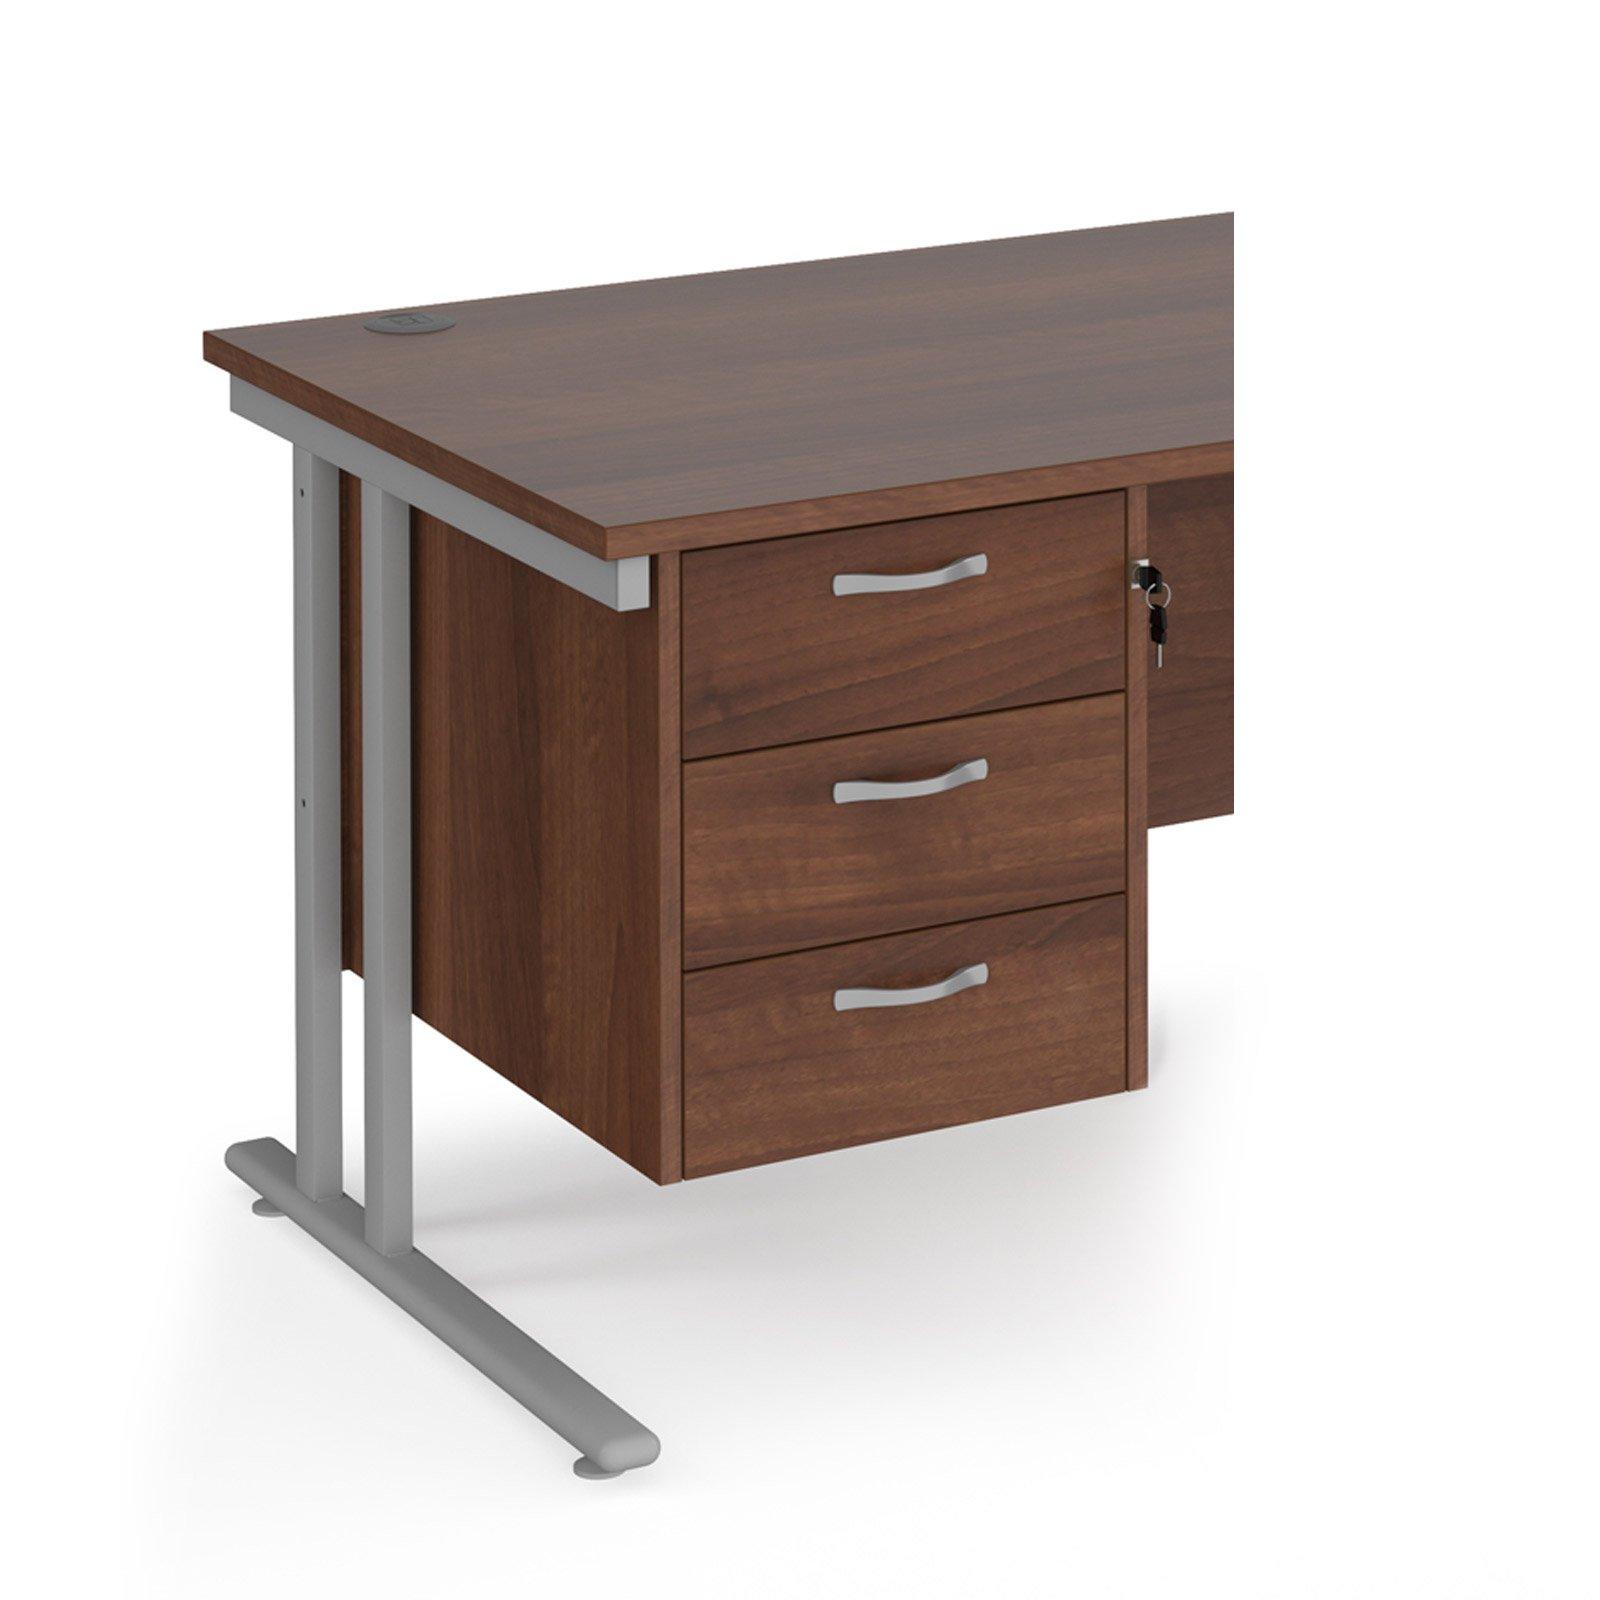 Image for Maestro 25 3 drawer fixed pedestal - walnut